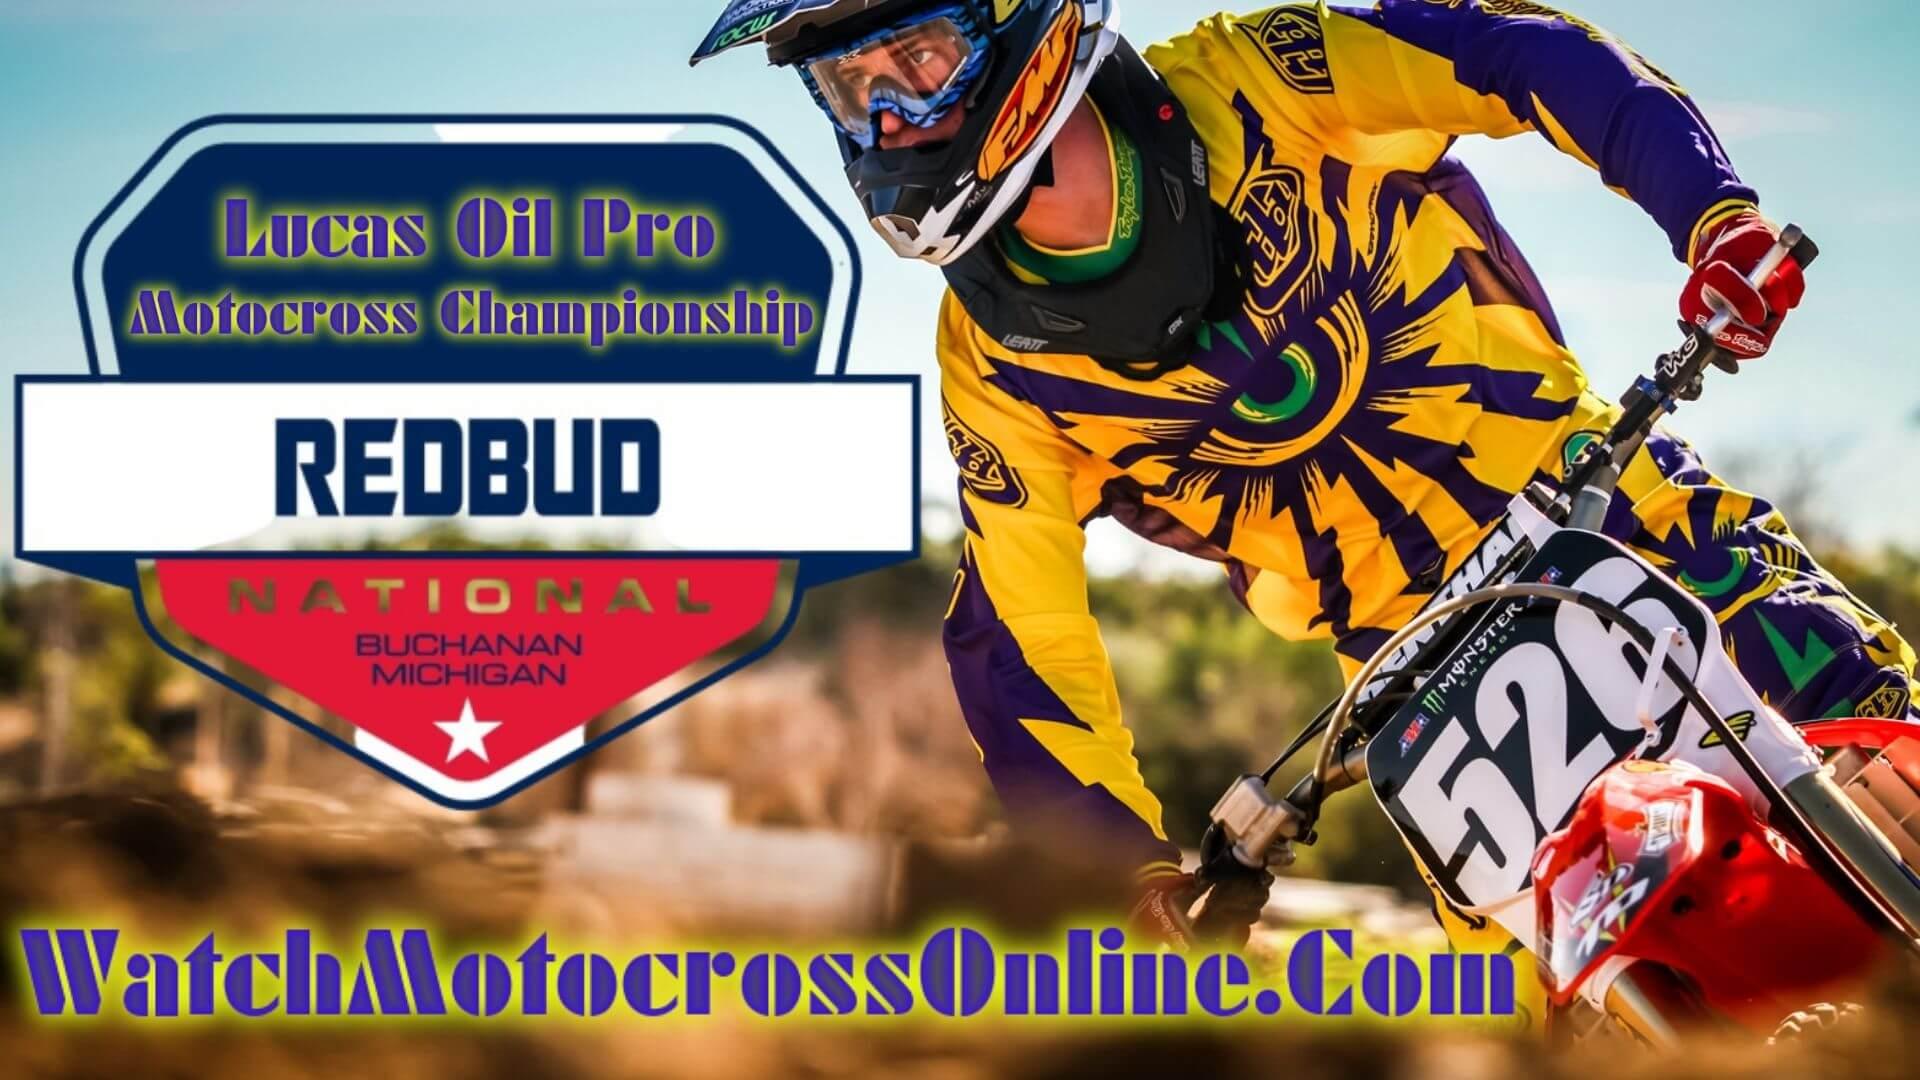 RedBud (1) : Pro Motocross Live Stream - 2020 - Video On Demand